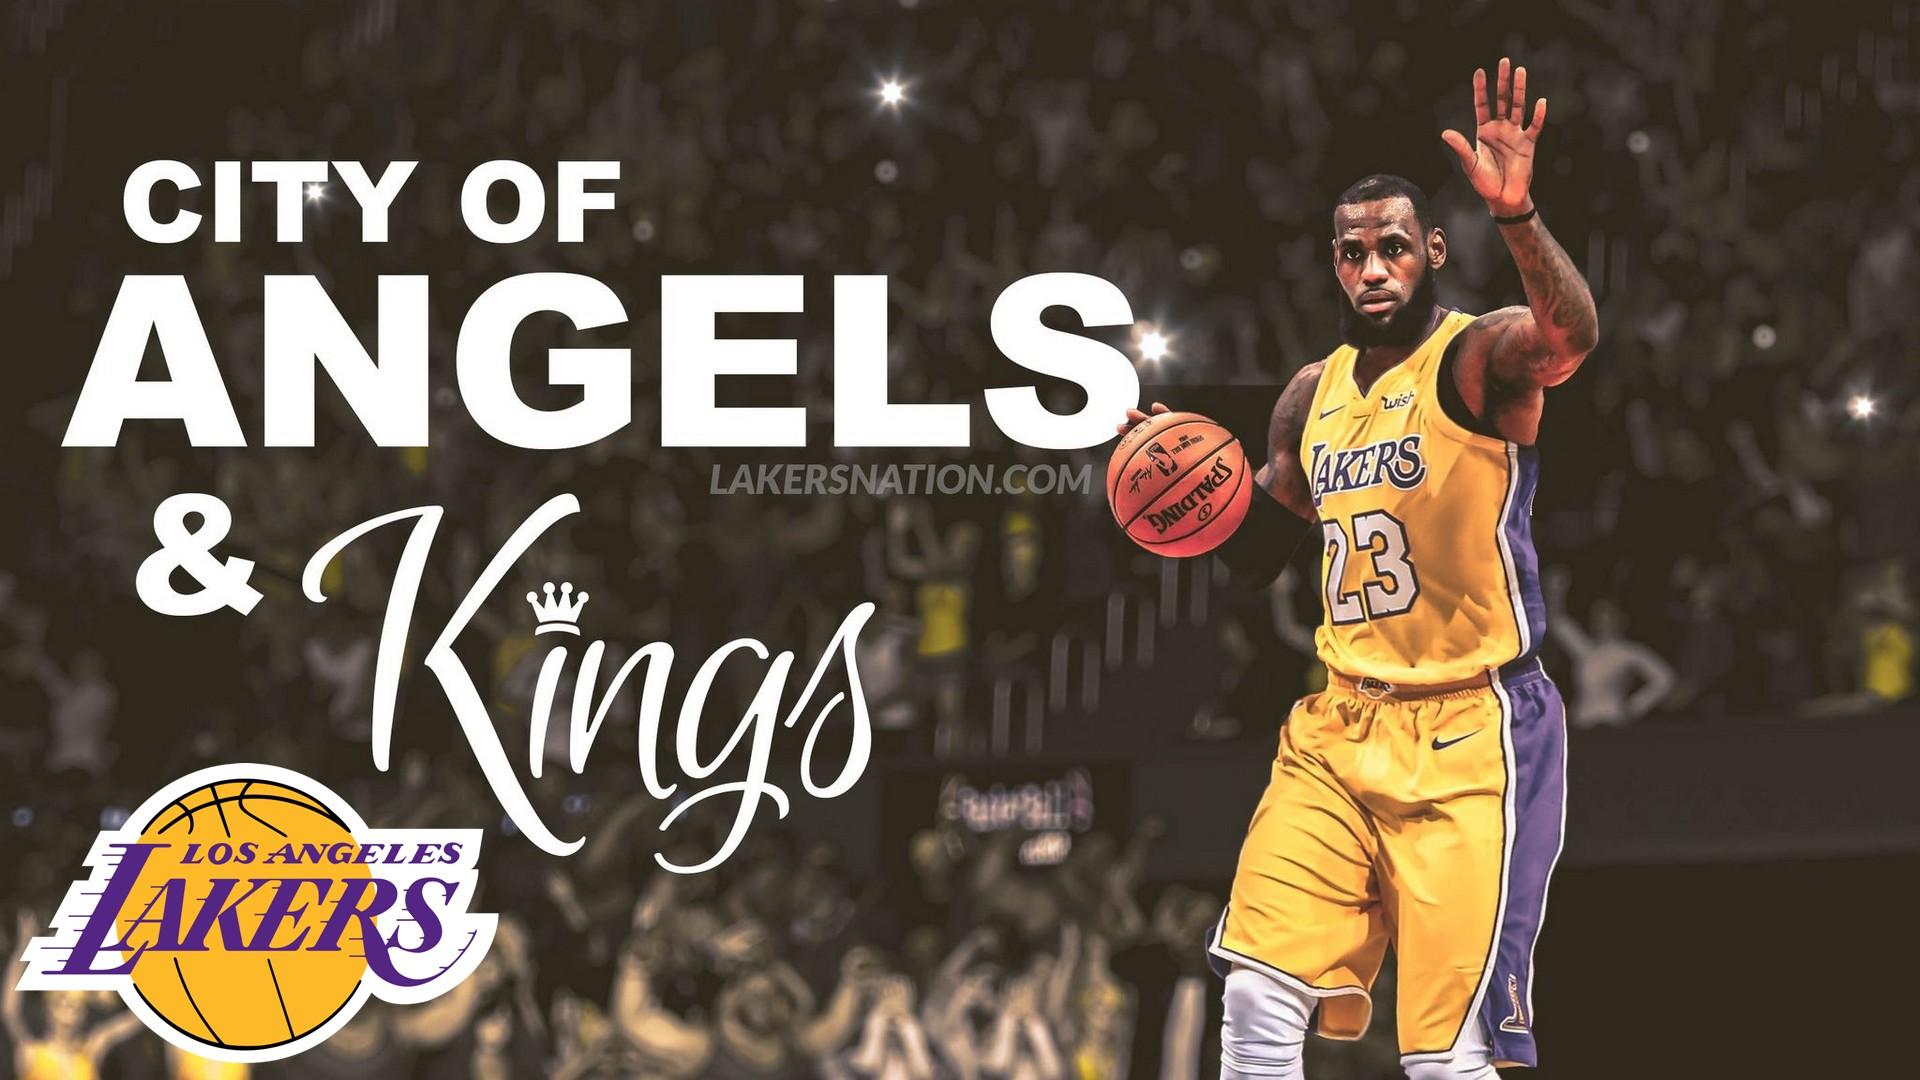 Wallpapers LeBron James Lakers 2020 Basketball Wallpaper 1920x1080